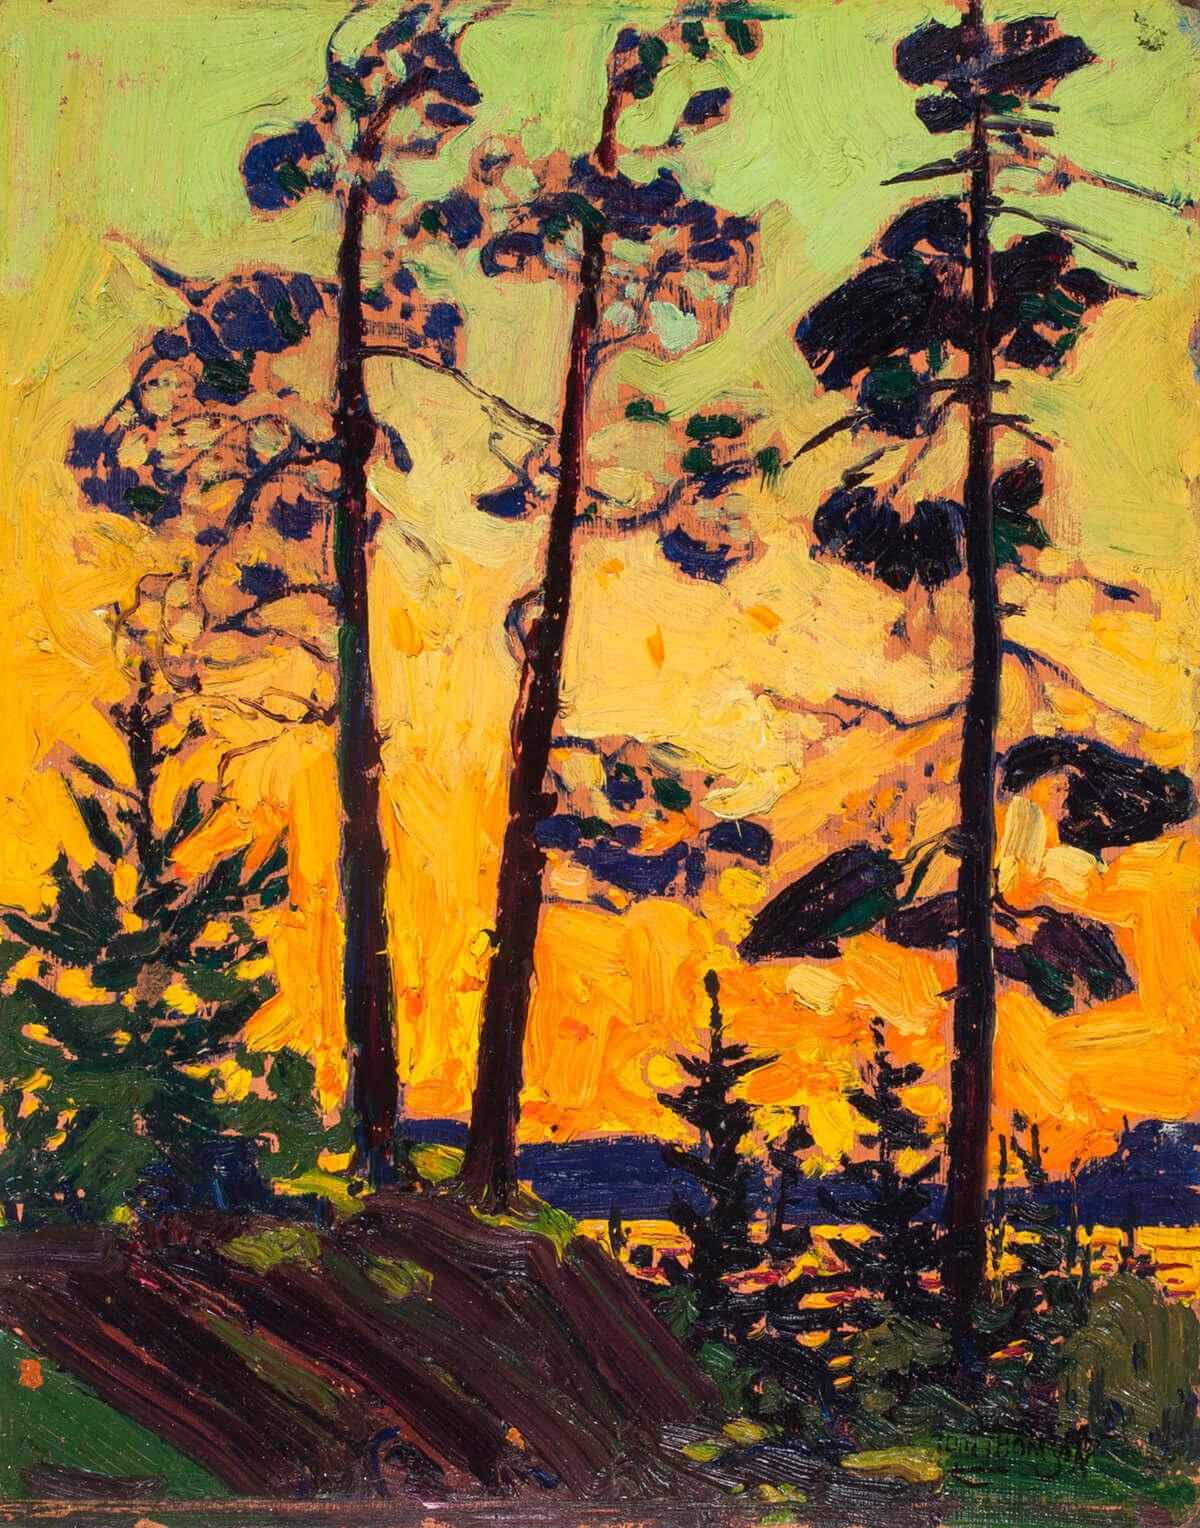 Tom Thomson, Pine Trees at Sunset, 1915